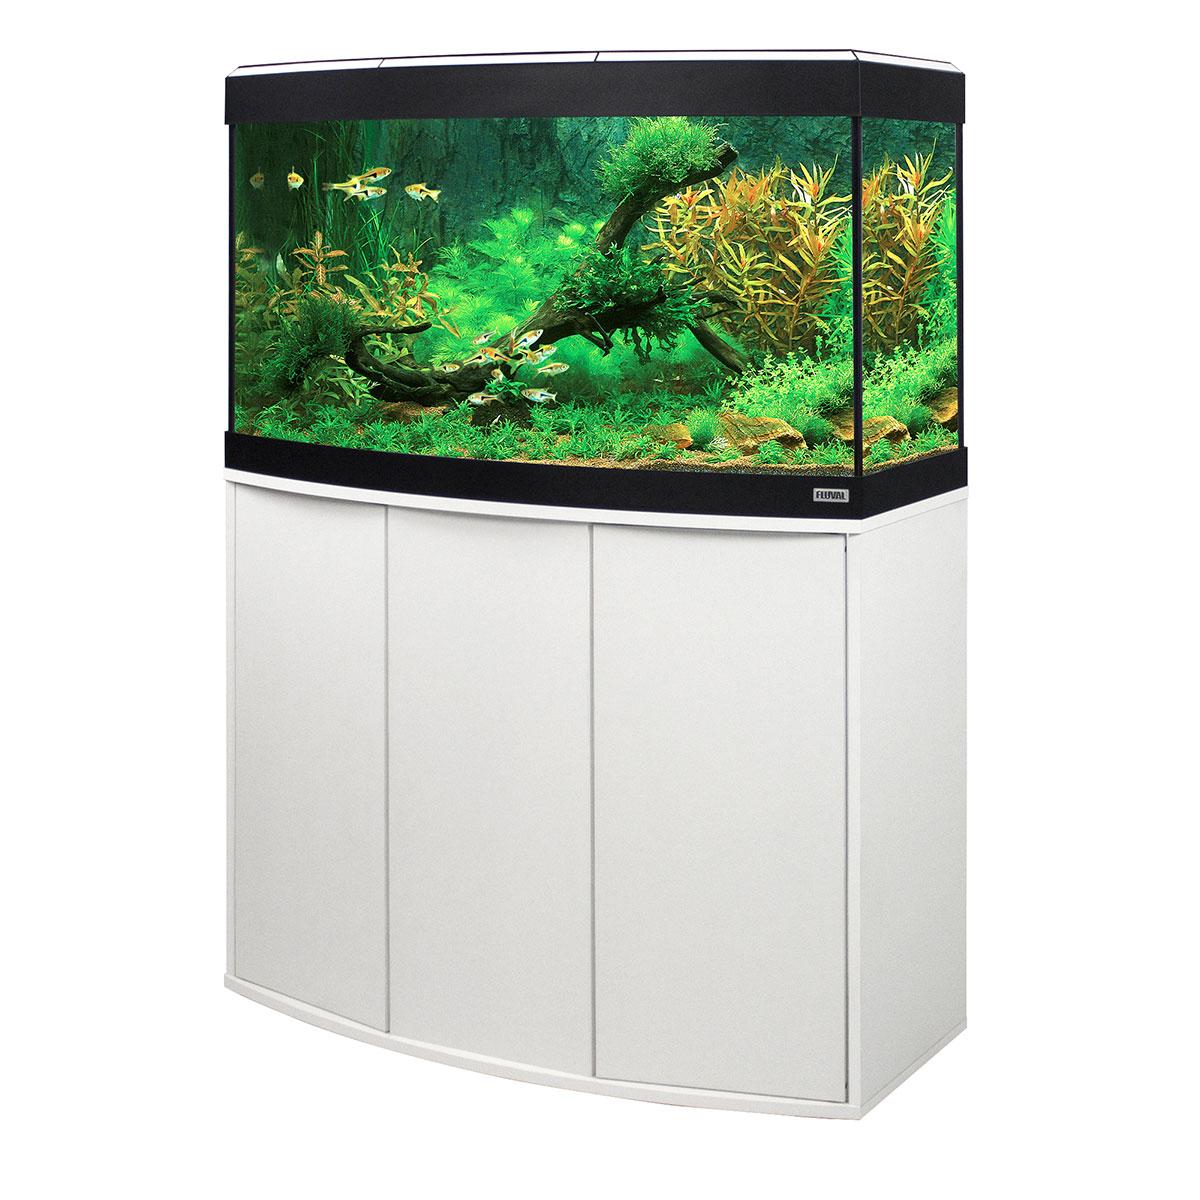 fluval panoramaaquarium mit led beleuchtung vicenza 180. Black Bedroom Furniture Sets. Home Design Ideas